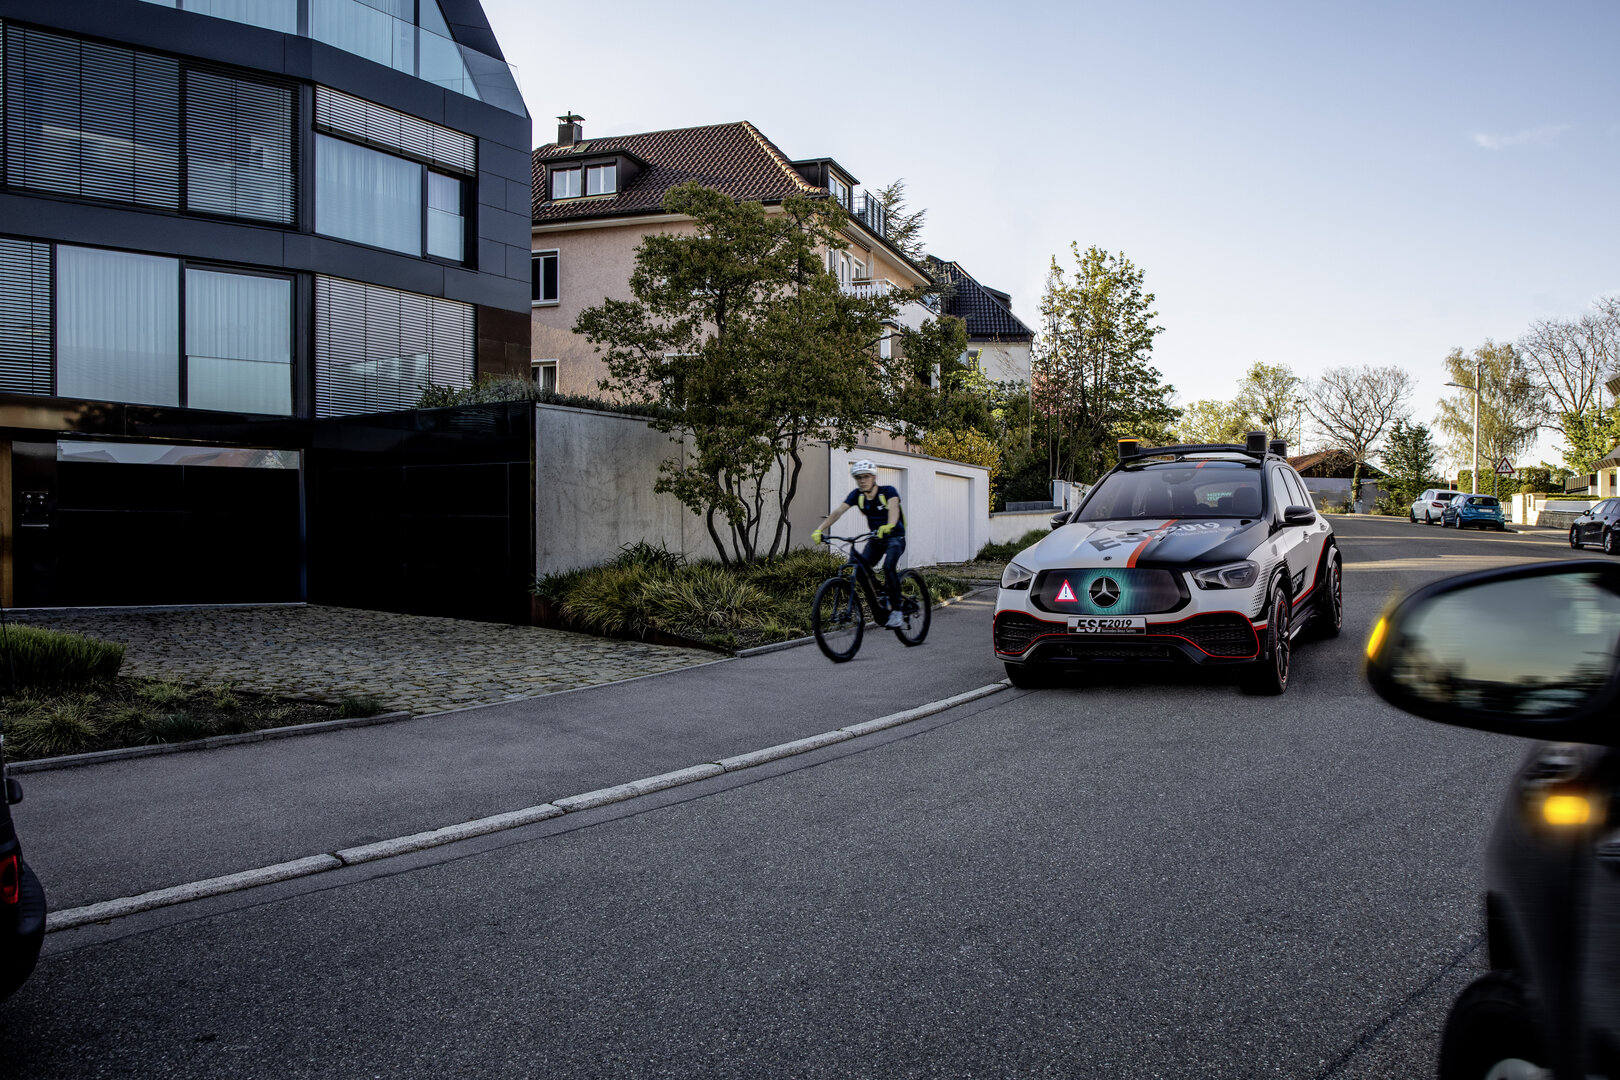 Auto warnt andere vor Fahrradfahrer